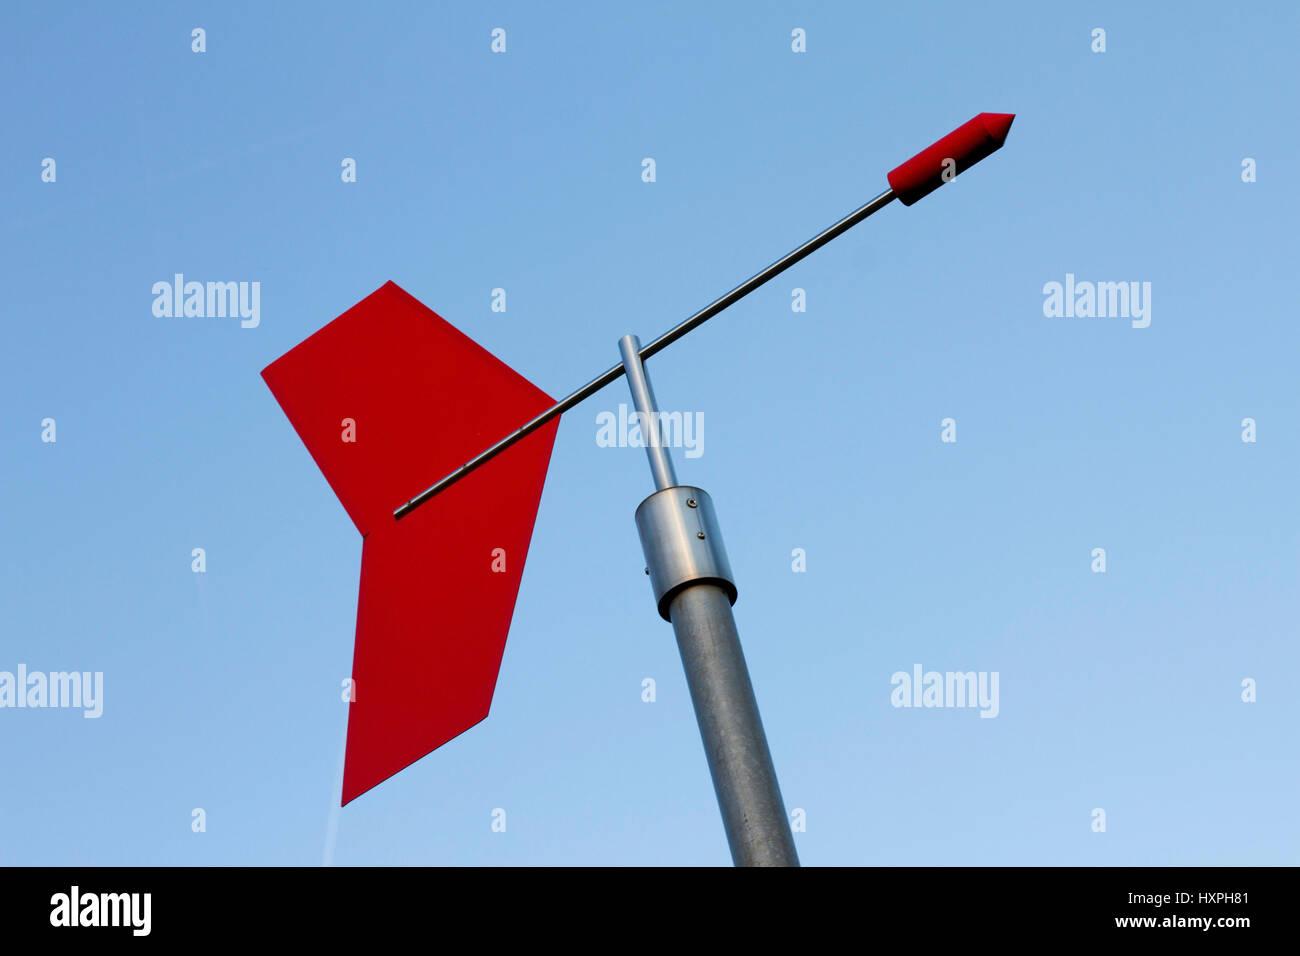 Wind direction indicator weather park Offenbach, Windrichtungsanzeiger Wetterpark Offenbach Stock Photo